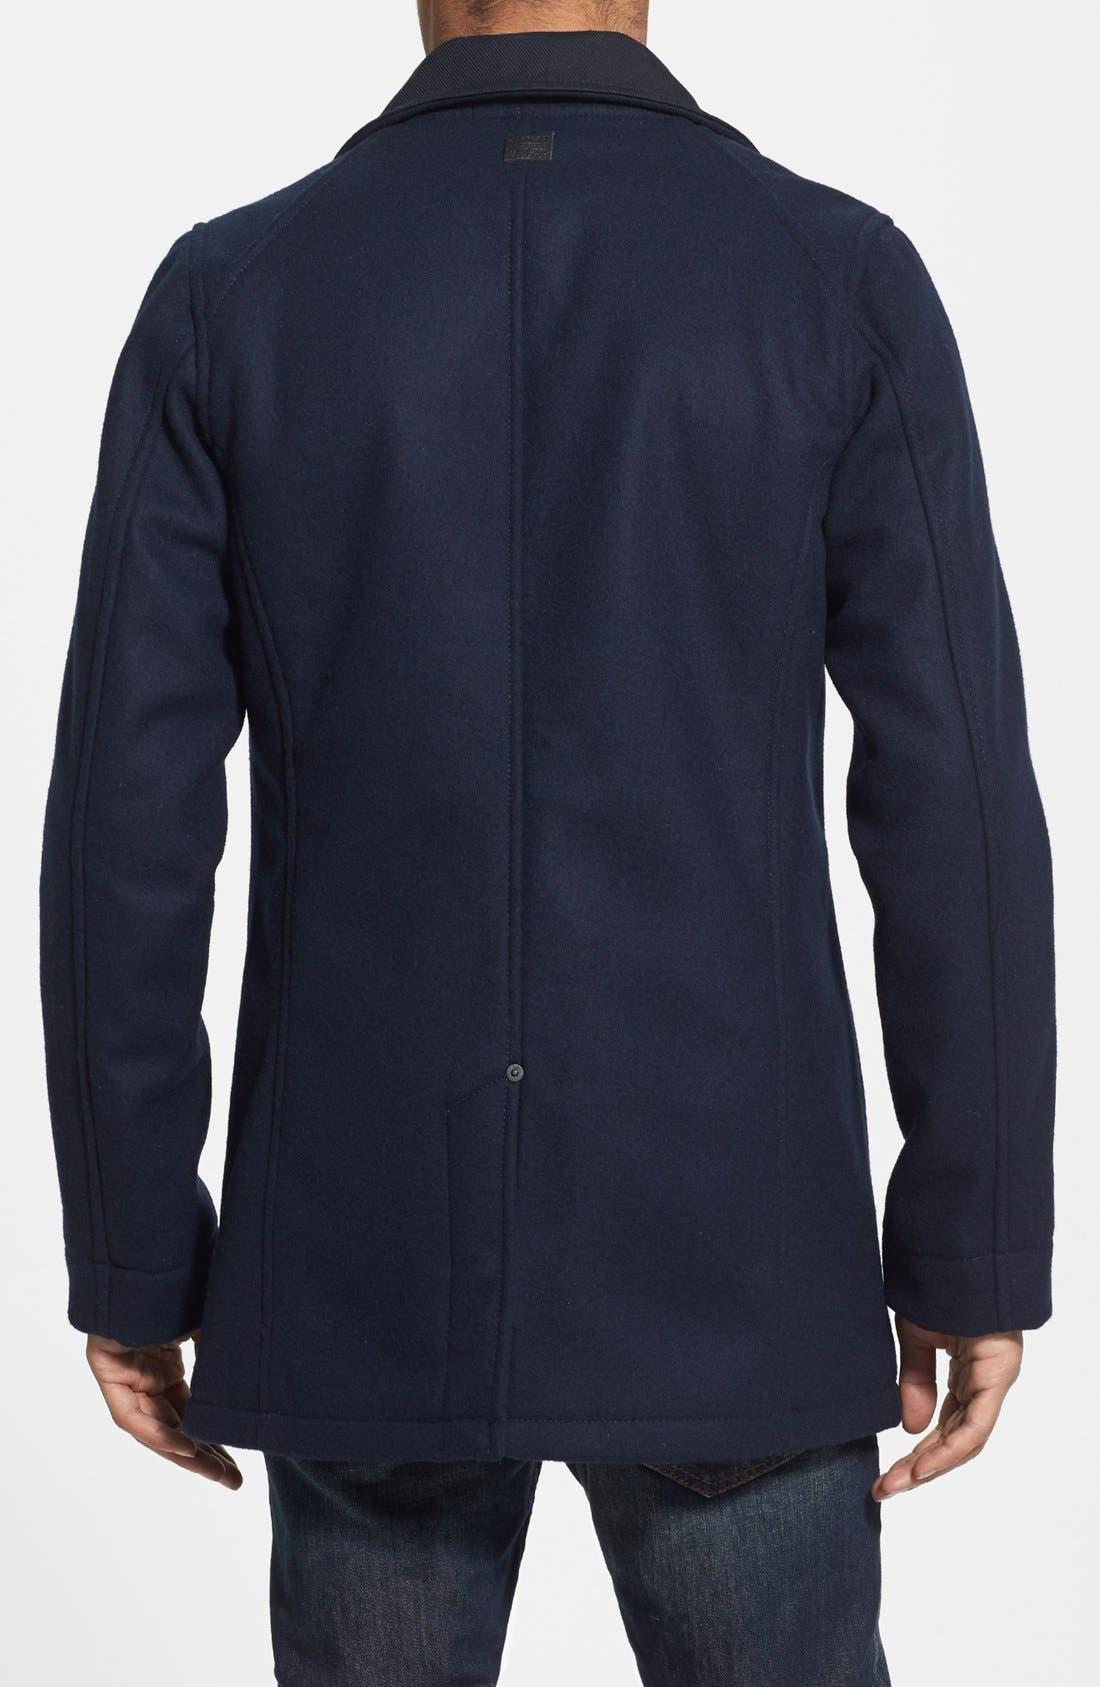 'Radar Garber' Wool Blend Jacket,                             Alternate thumbnail 3, color,                             400